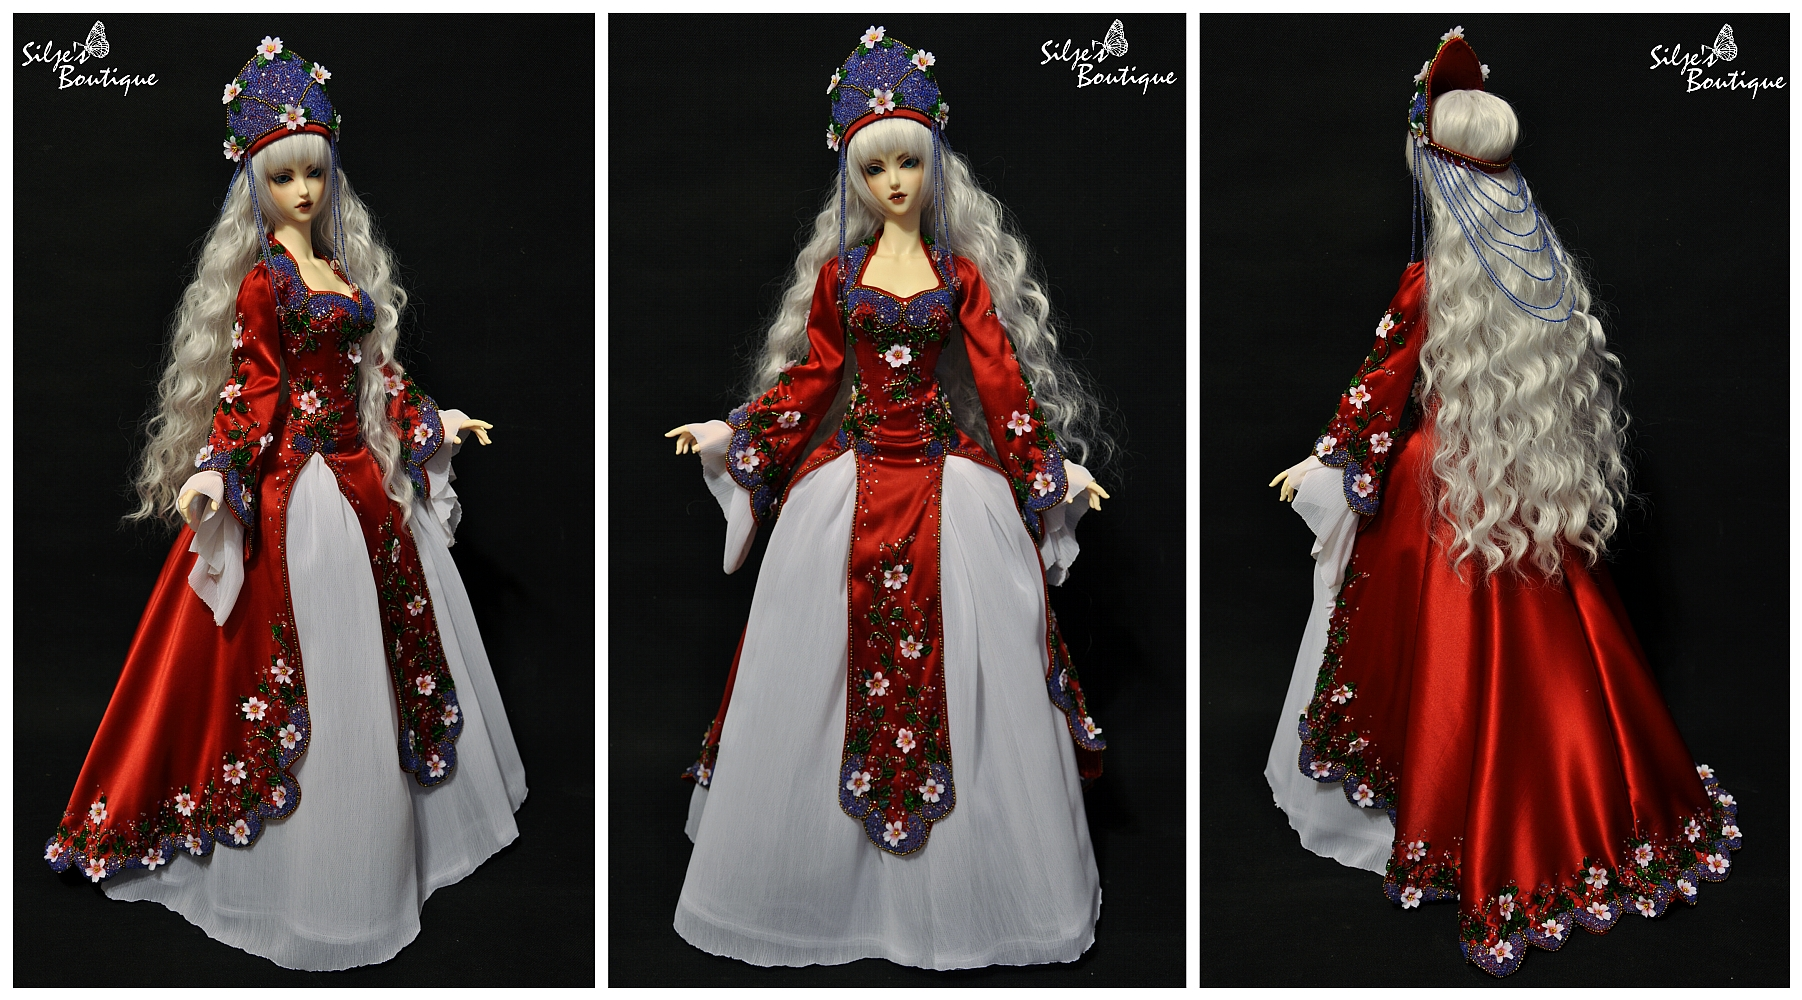 Siljes Special 003-Sakura dress by mio27